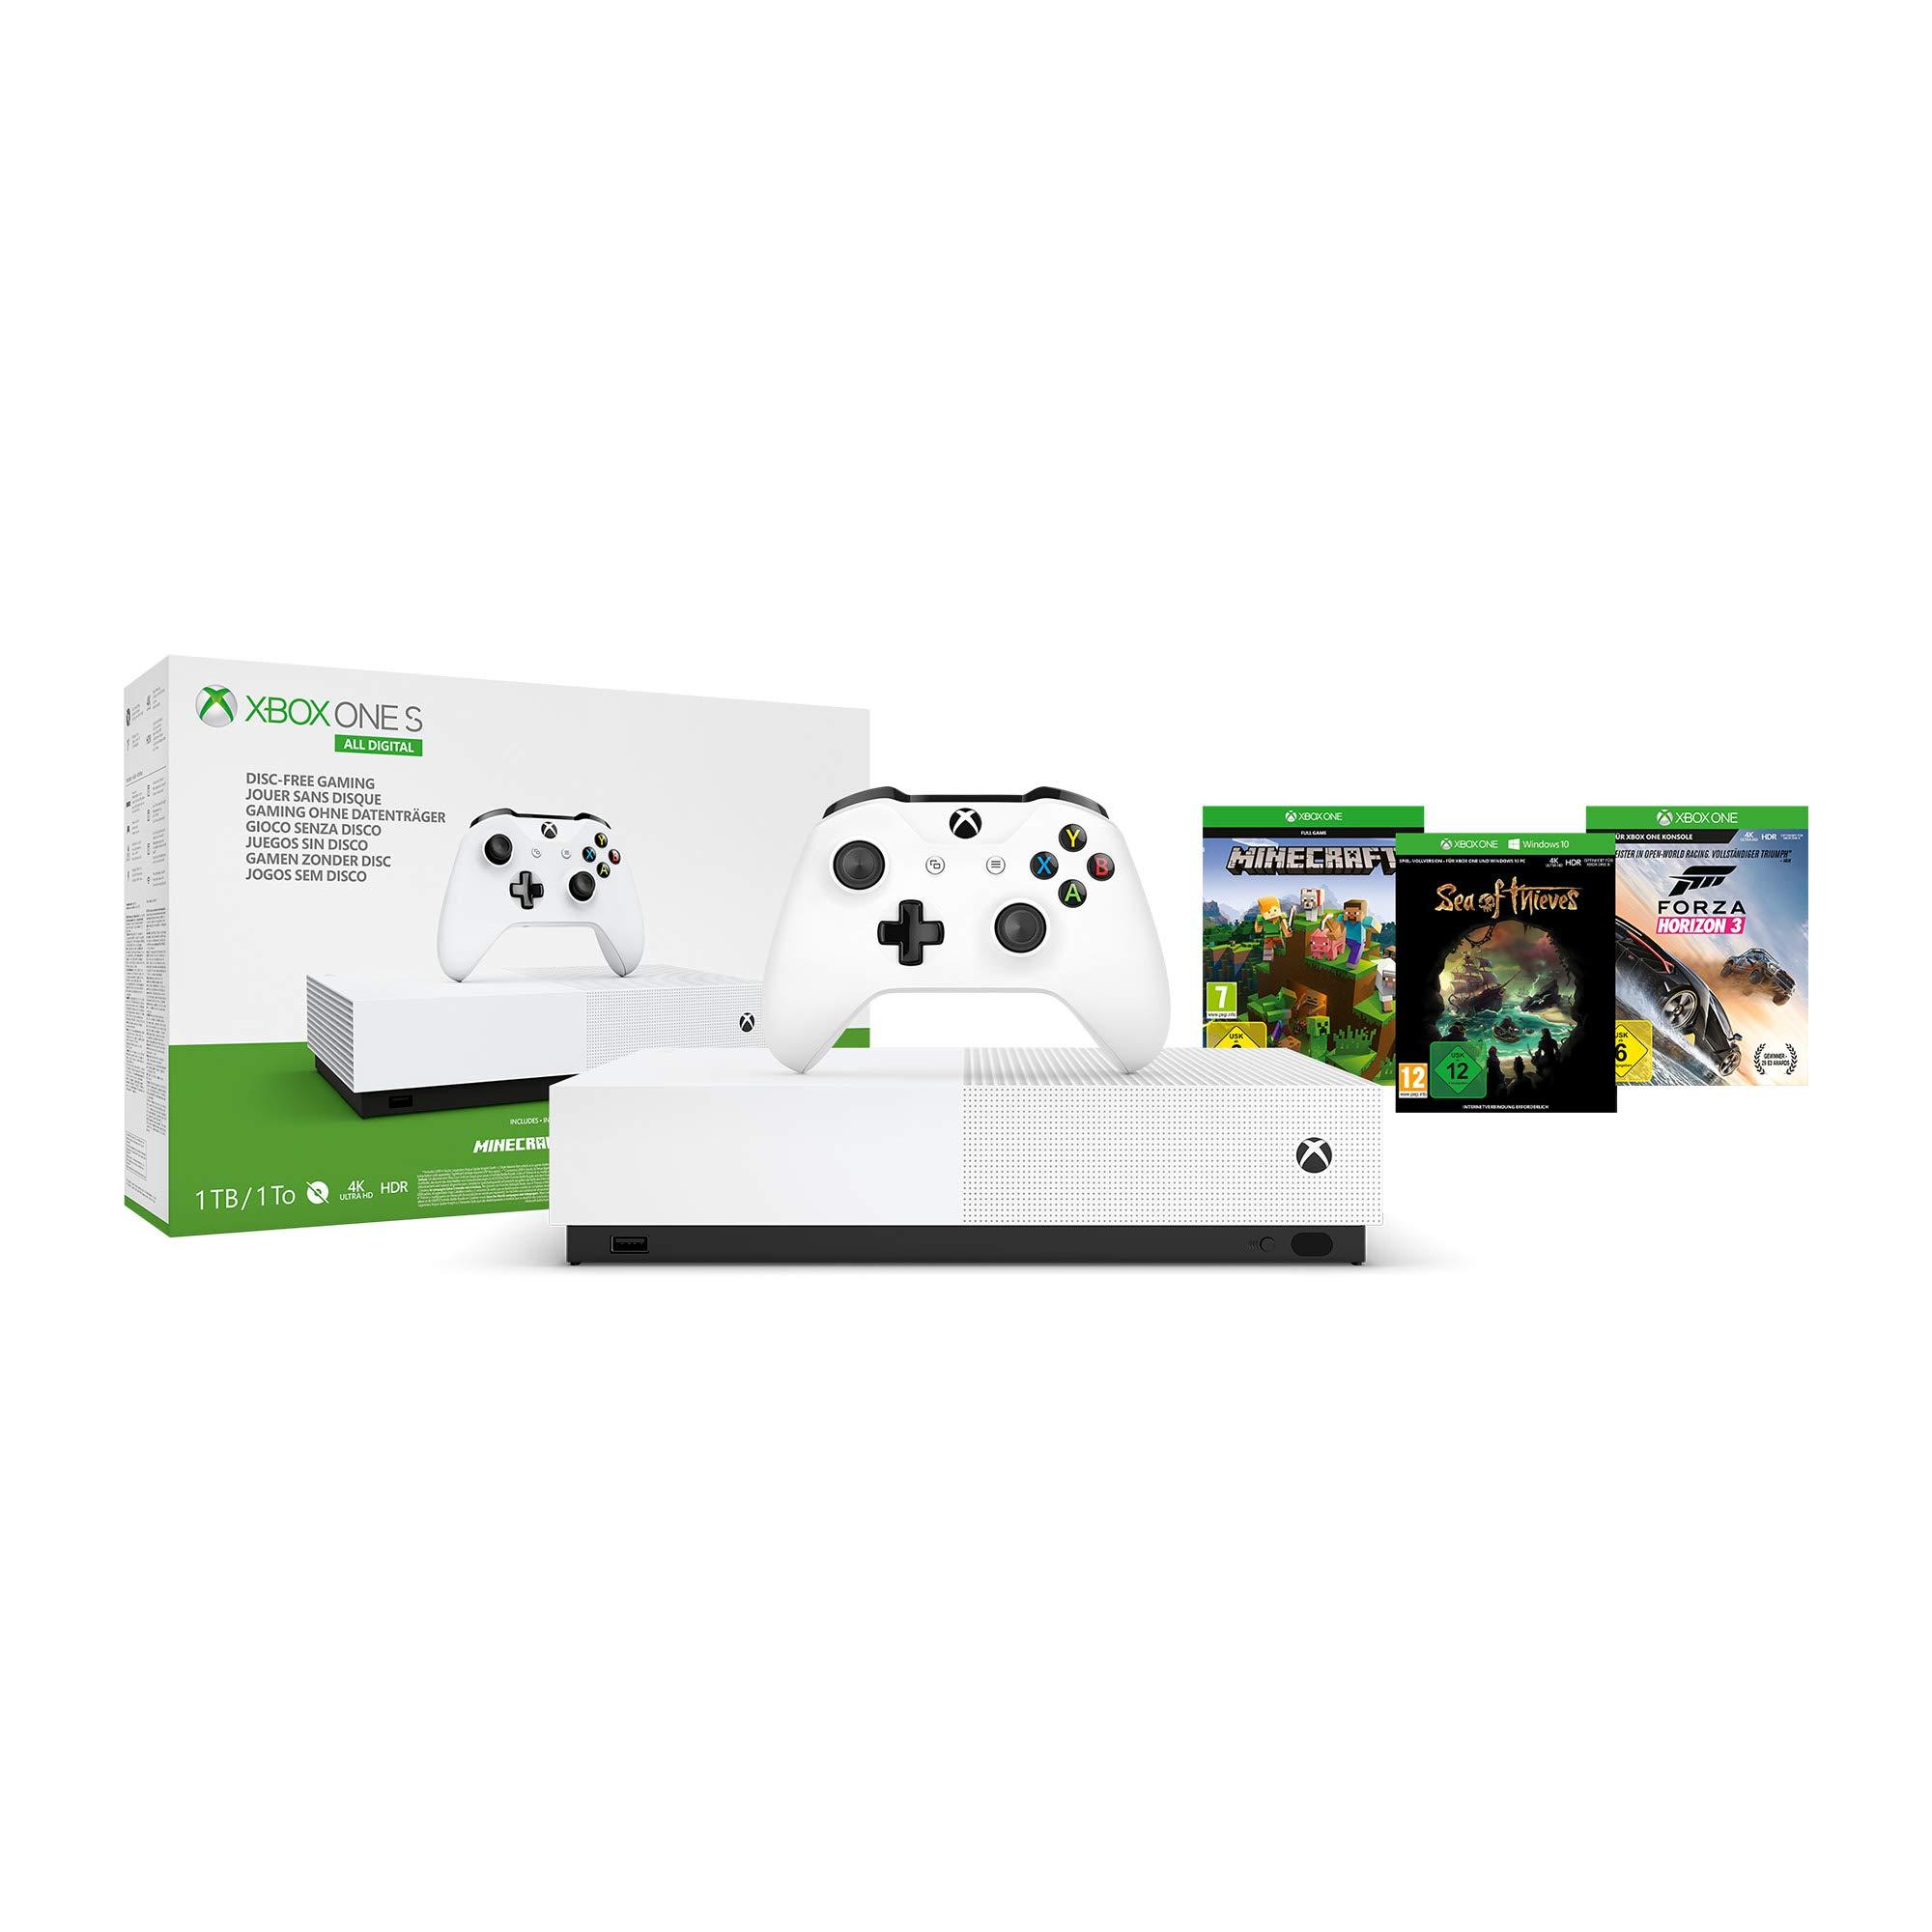 Sélection de packs Xbox One - Ex : Console All Digital (1 To) + Forza Horizon 3 (ou Fortnite) + Minecraft + Sea of Thieves (dématérialisés)